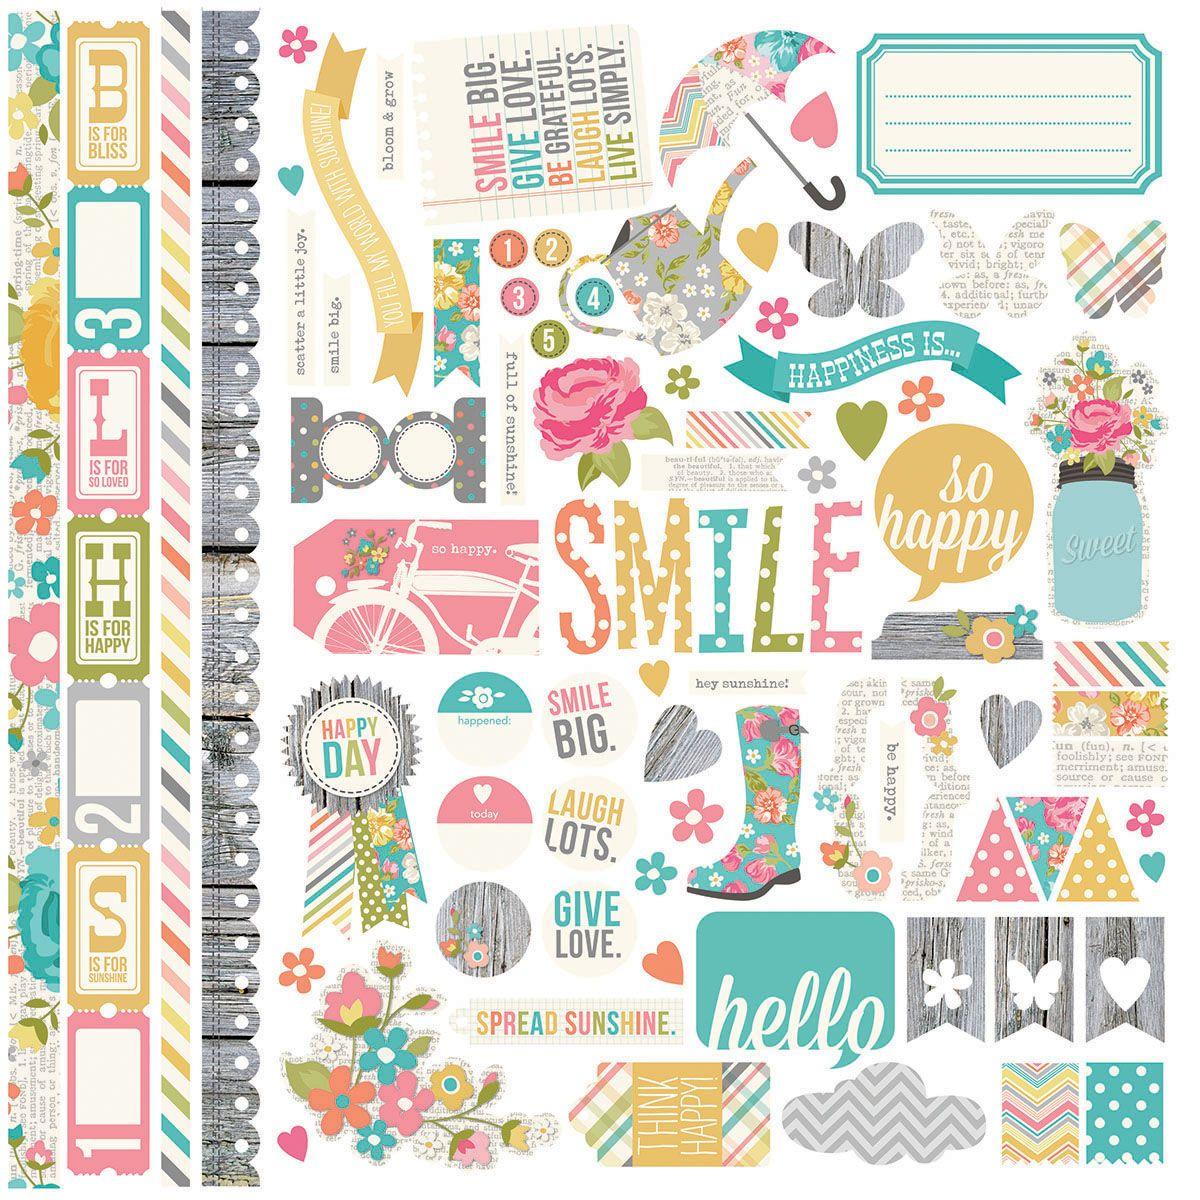 Fundamentals 12x12 Sticker | Printable stickers, Stickers ...